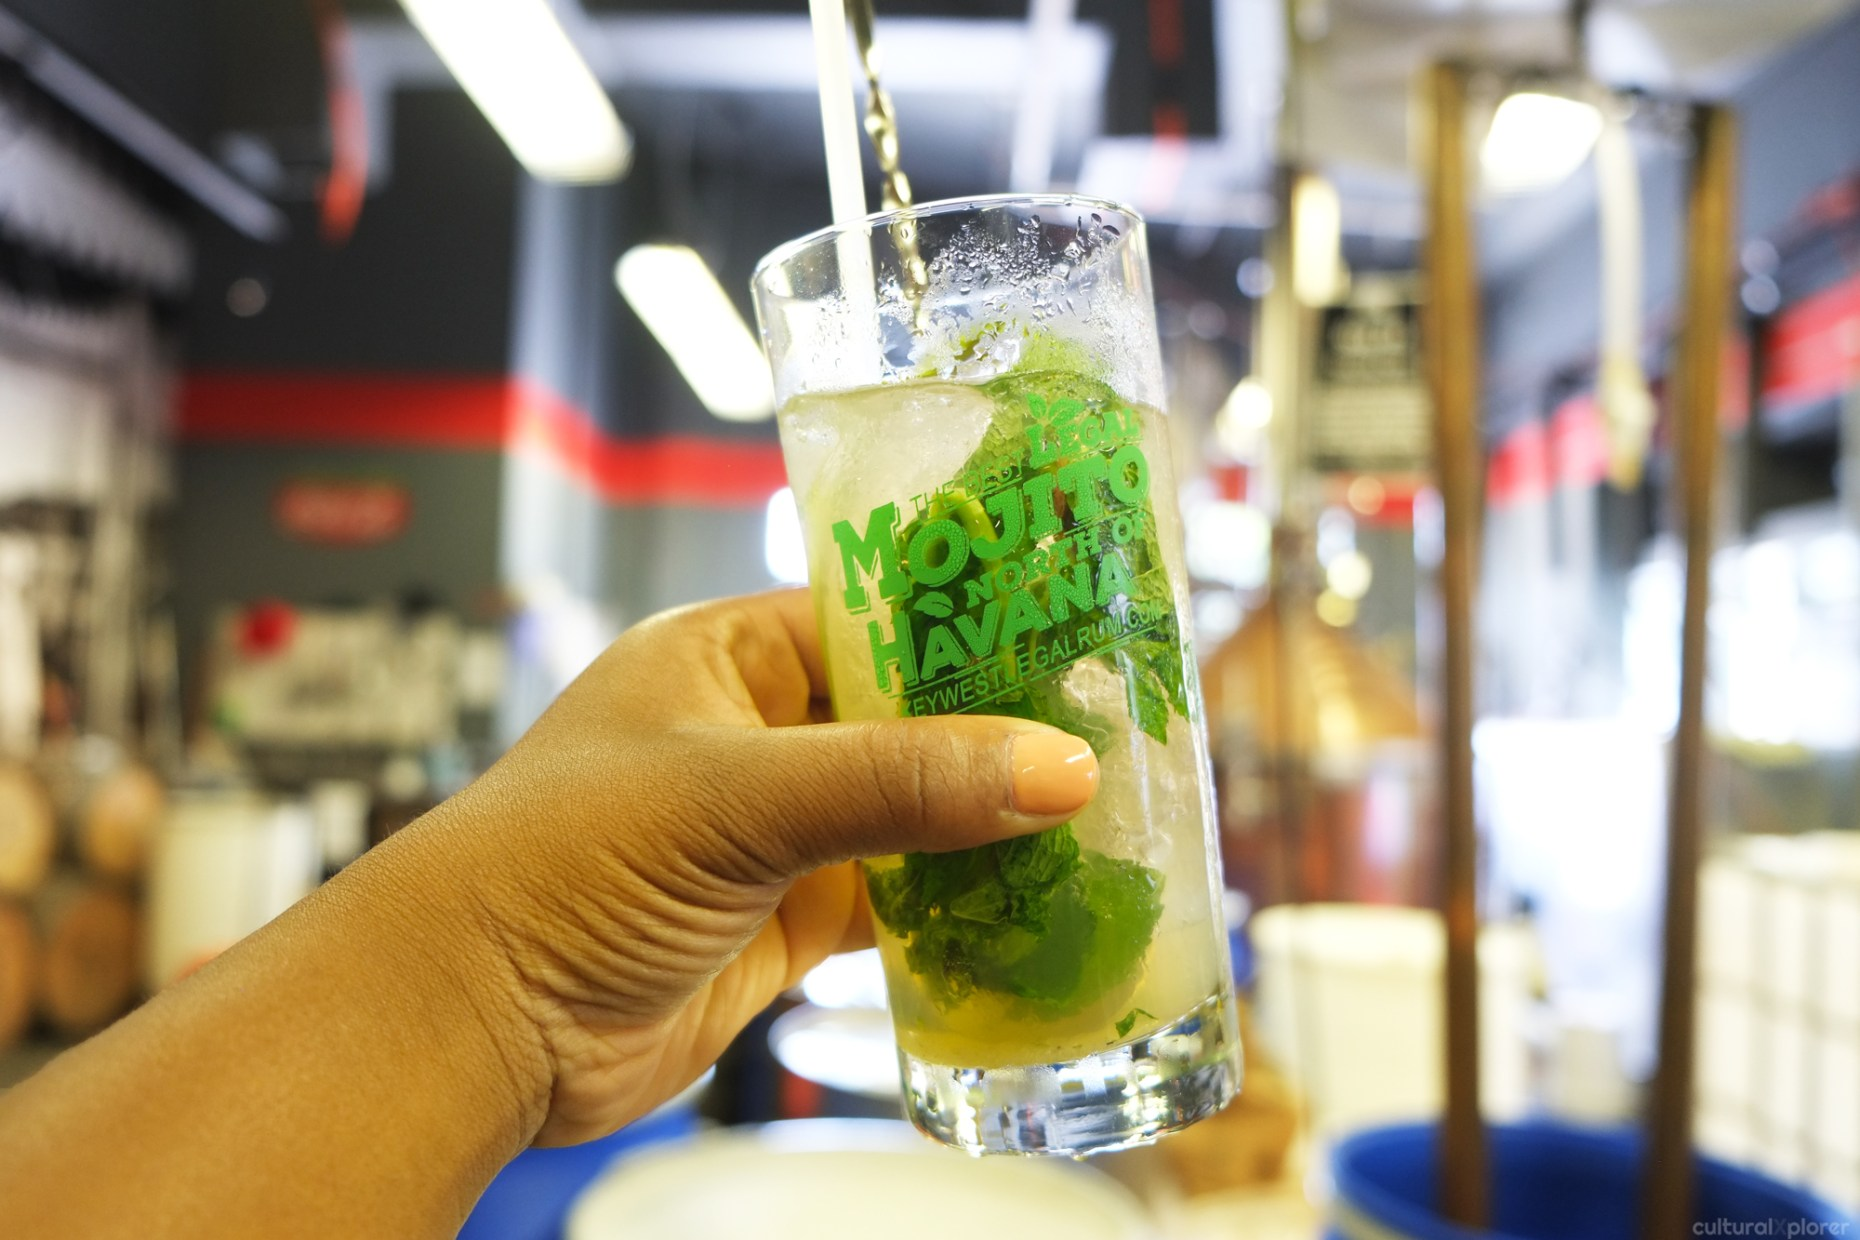 Key West Legal Rum Distillery